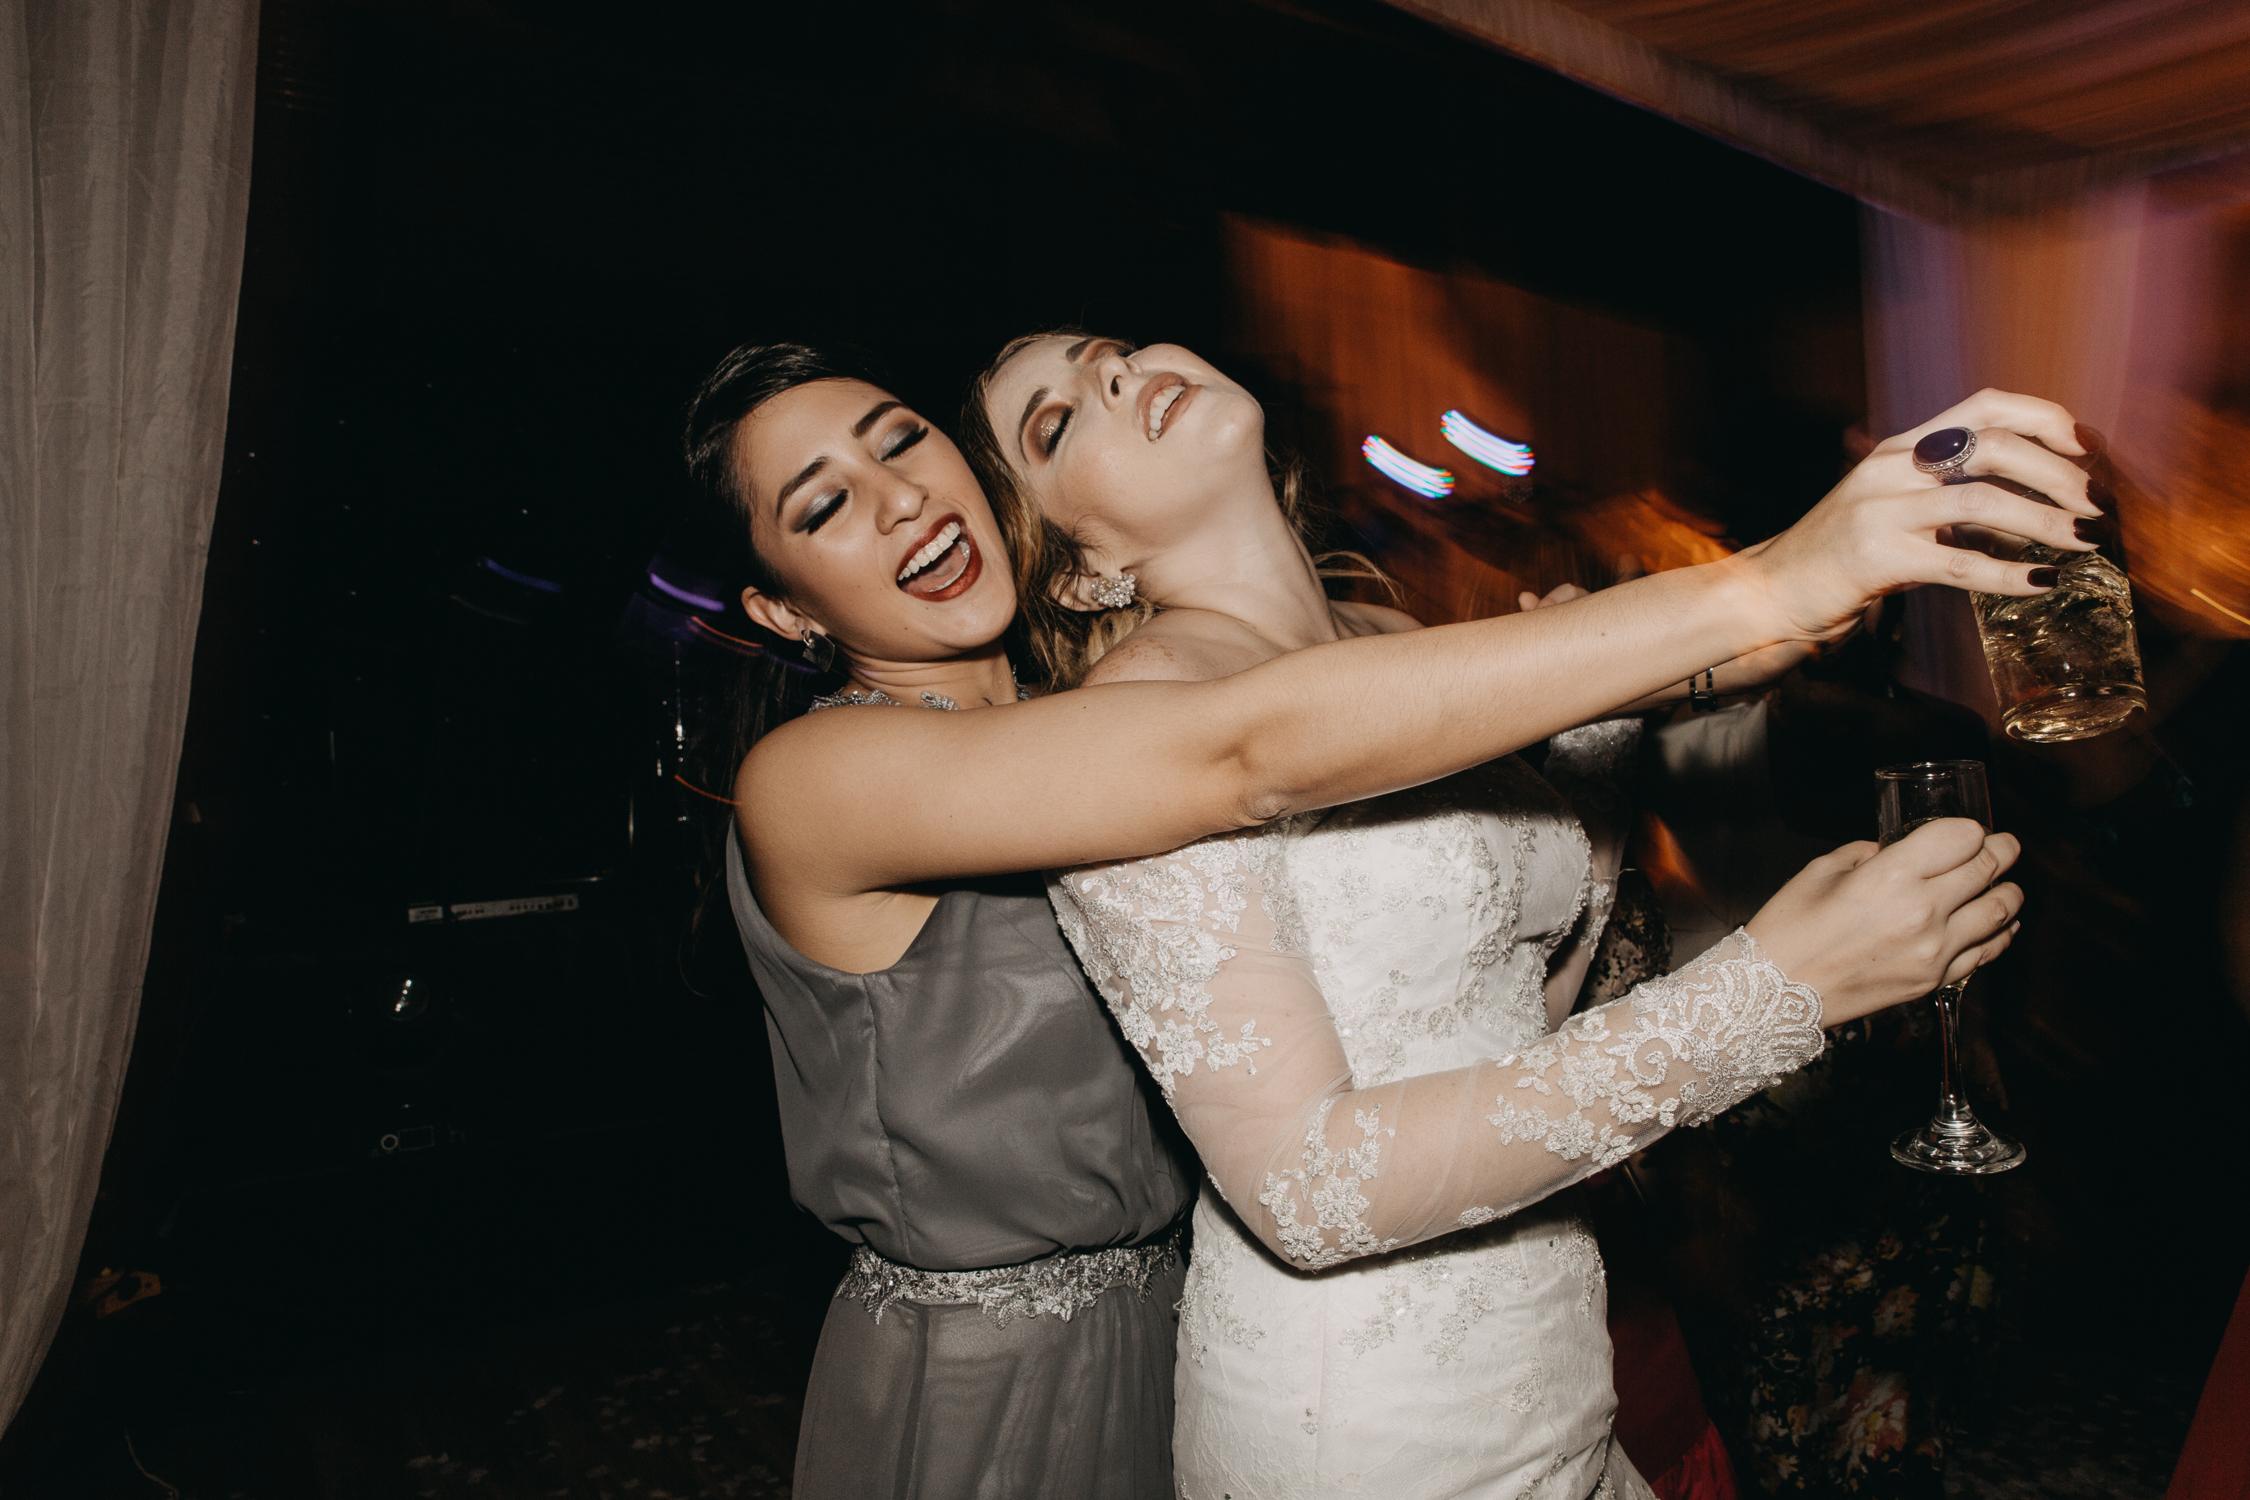 Michelle-Agurto-Fotografia-Bodas-Ecuador-Destination-Wedding-Photographer-Vicky-Javier-279.JPG